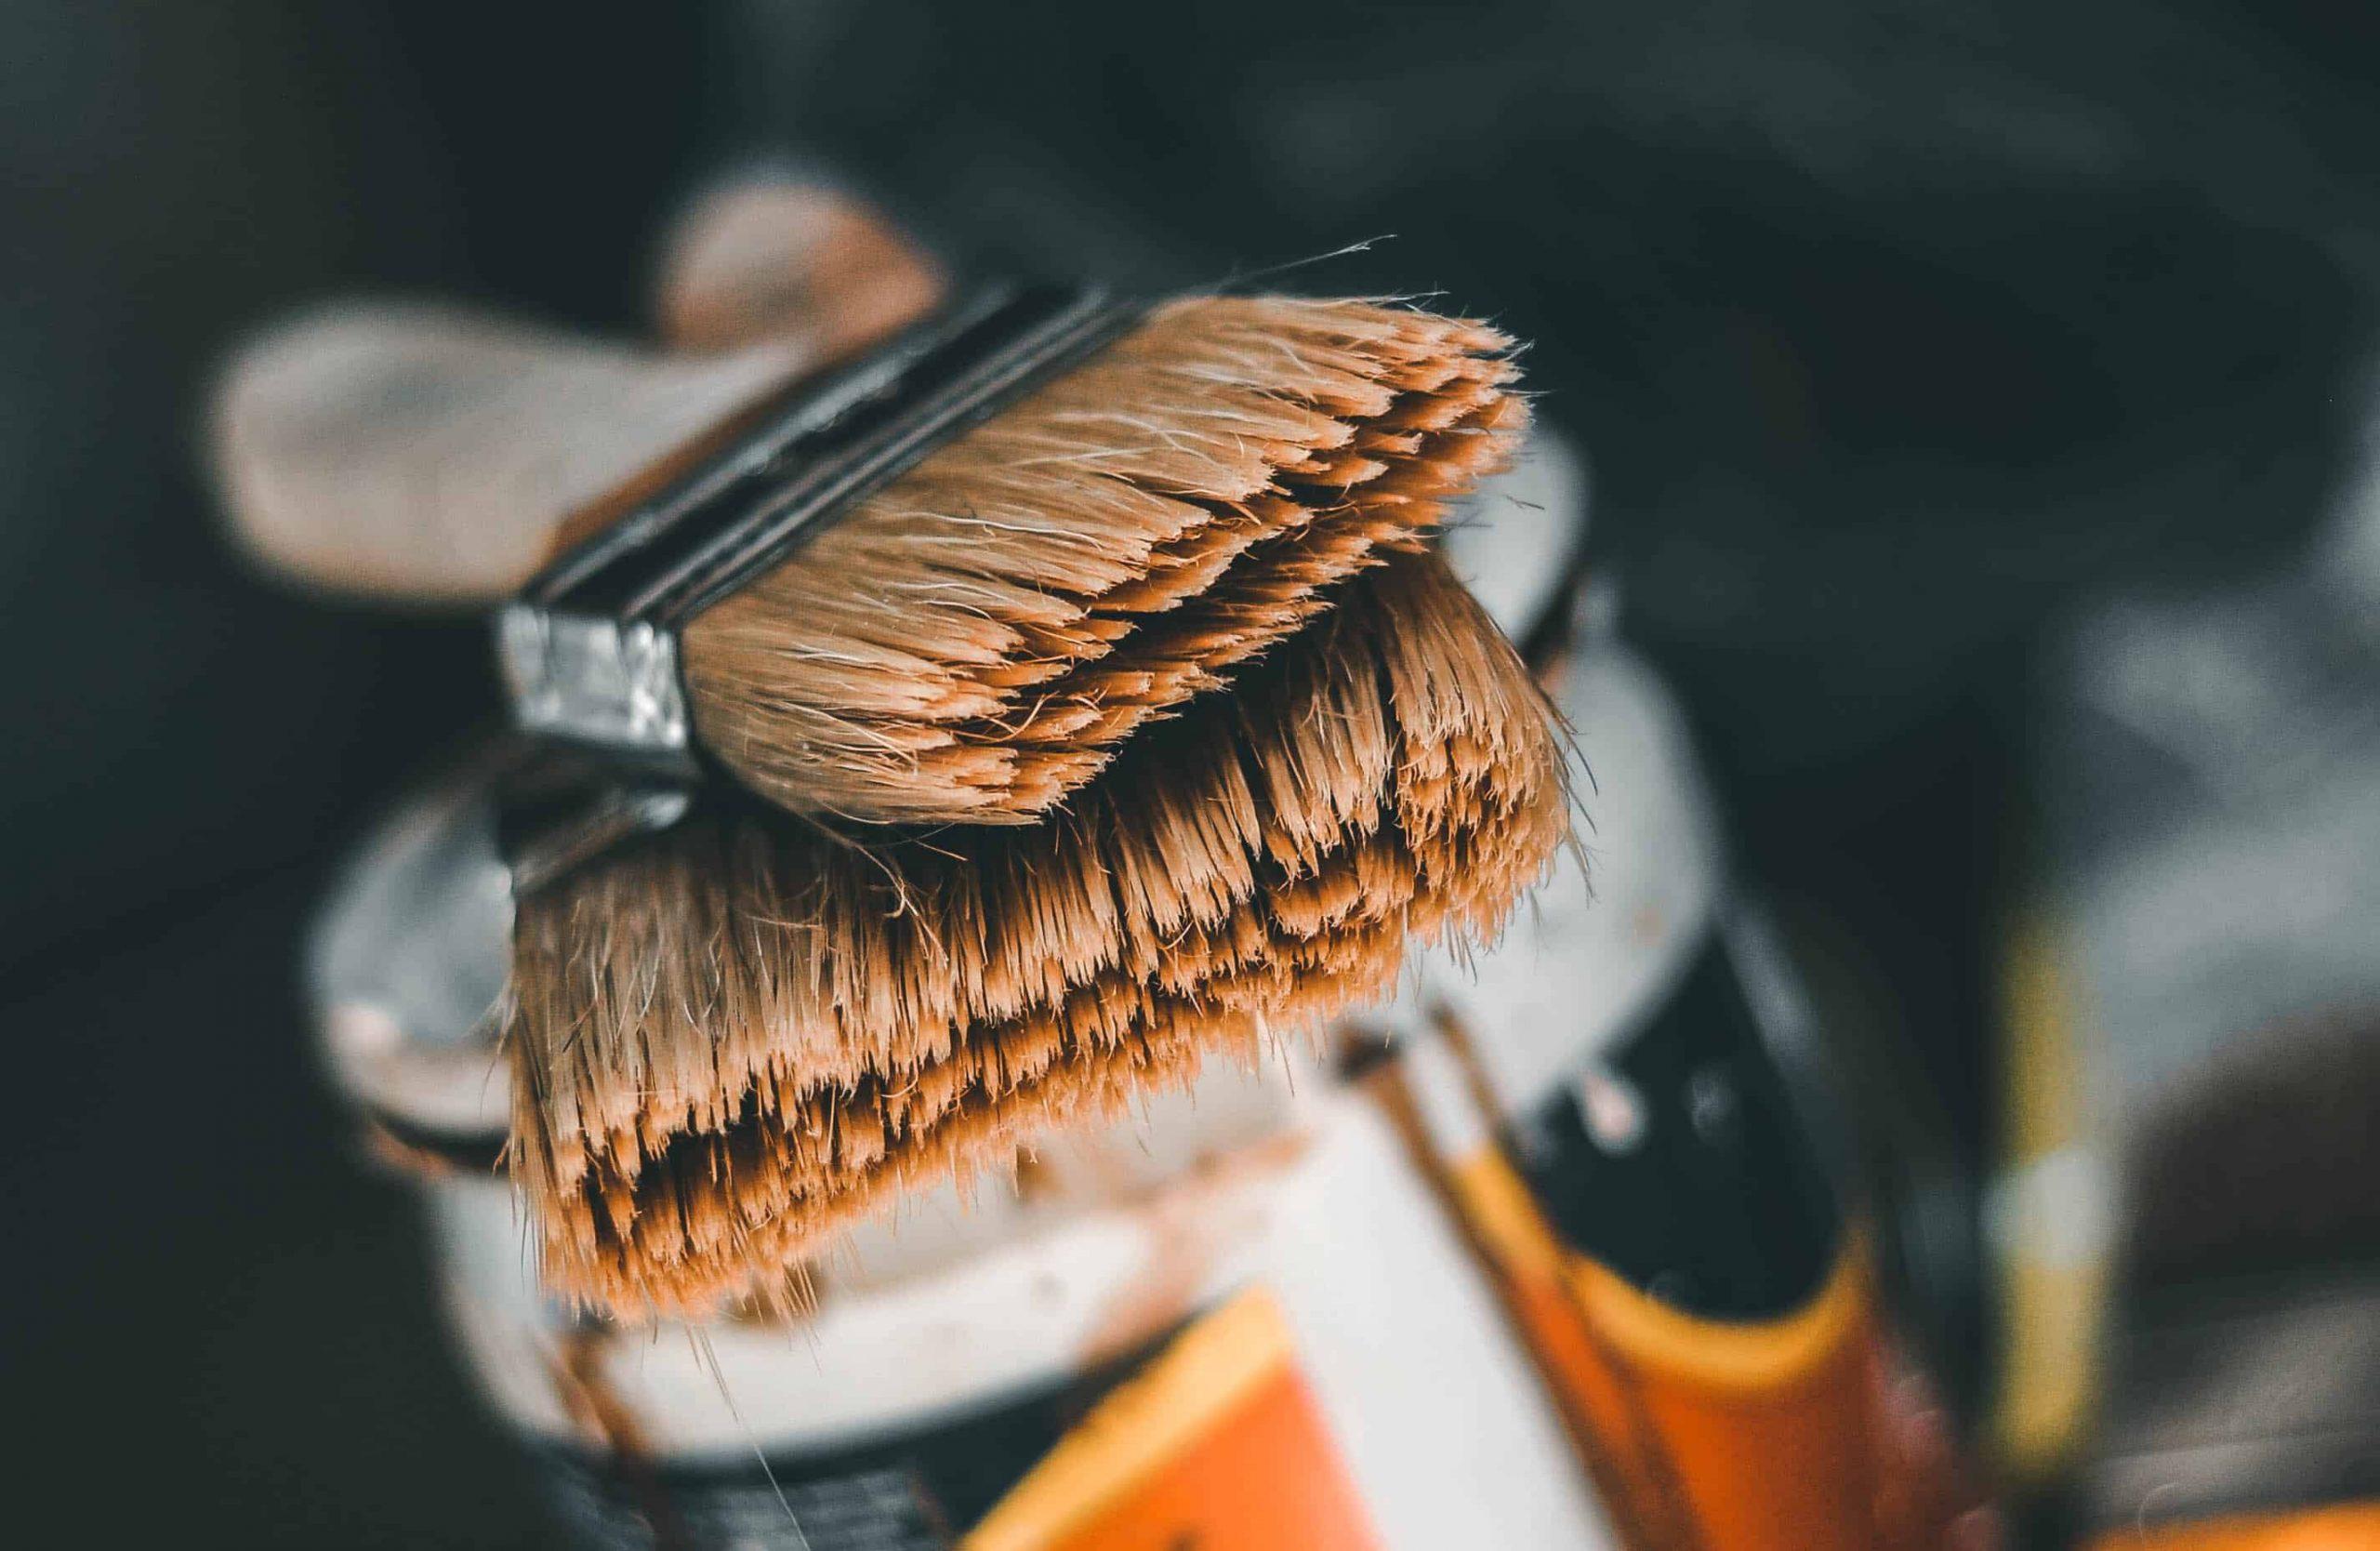 How many coats of primer on wood